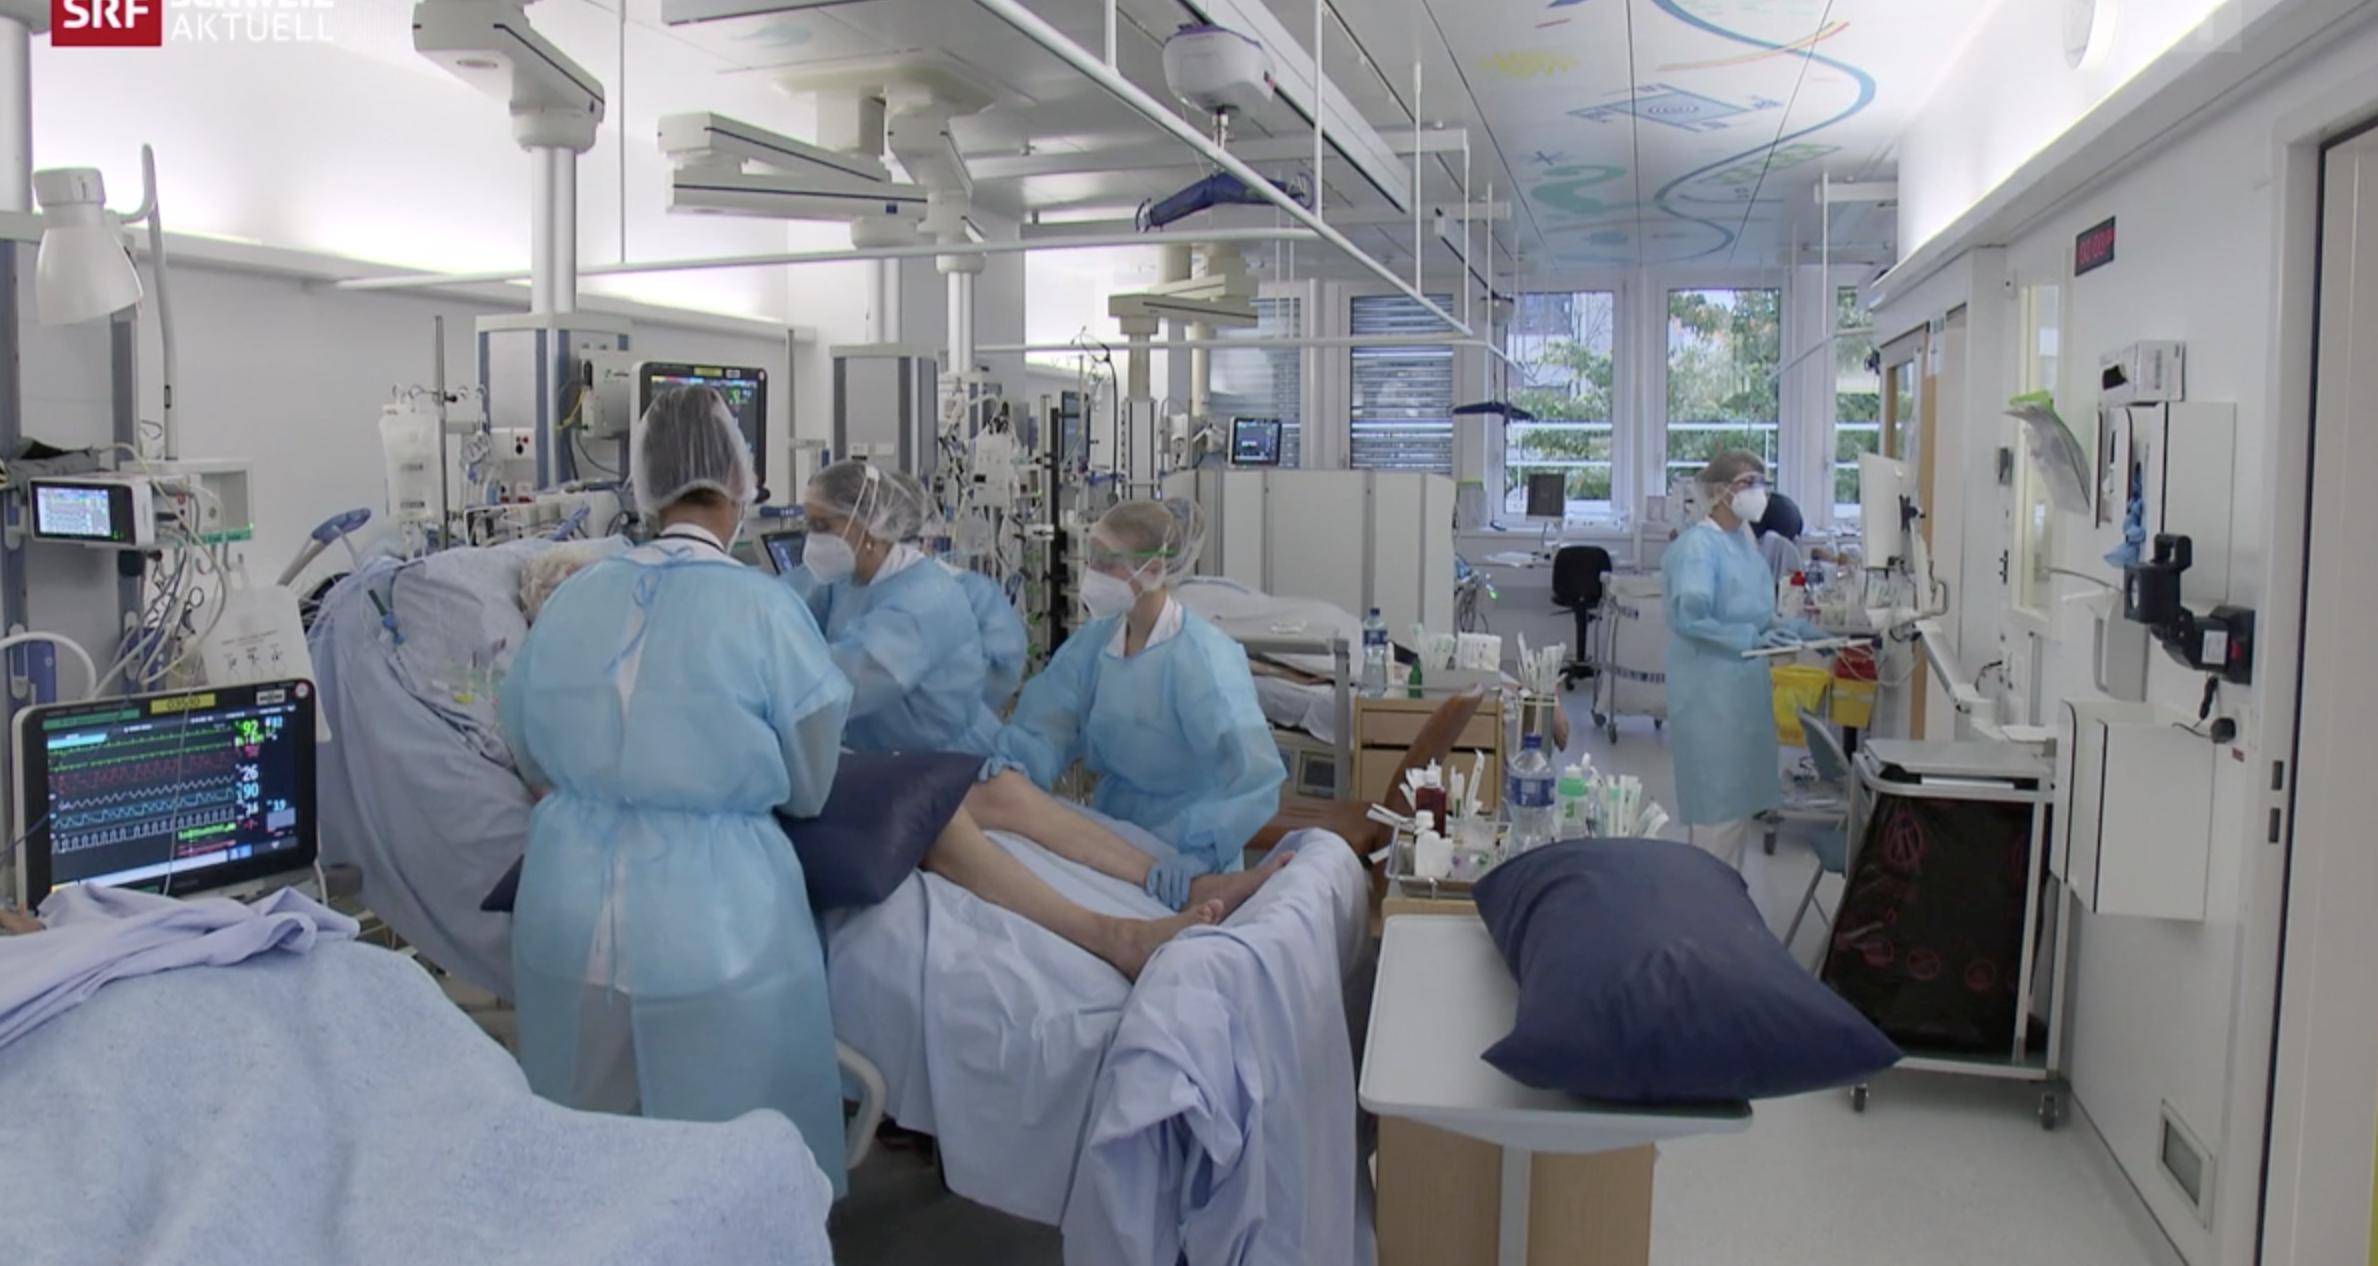 Spital_Betten_SRF